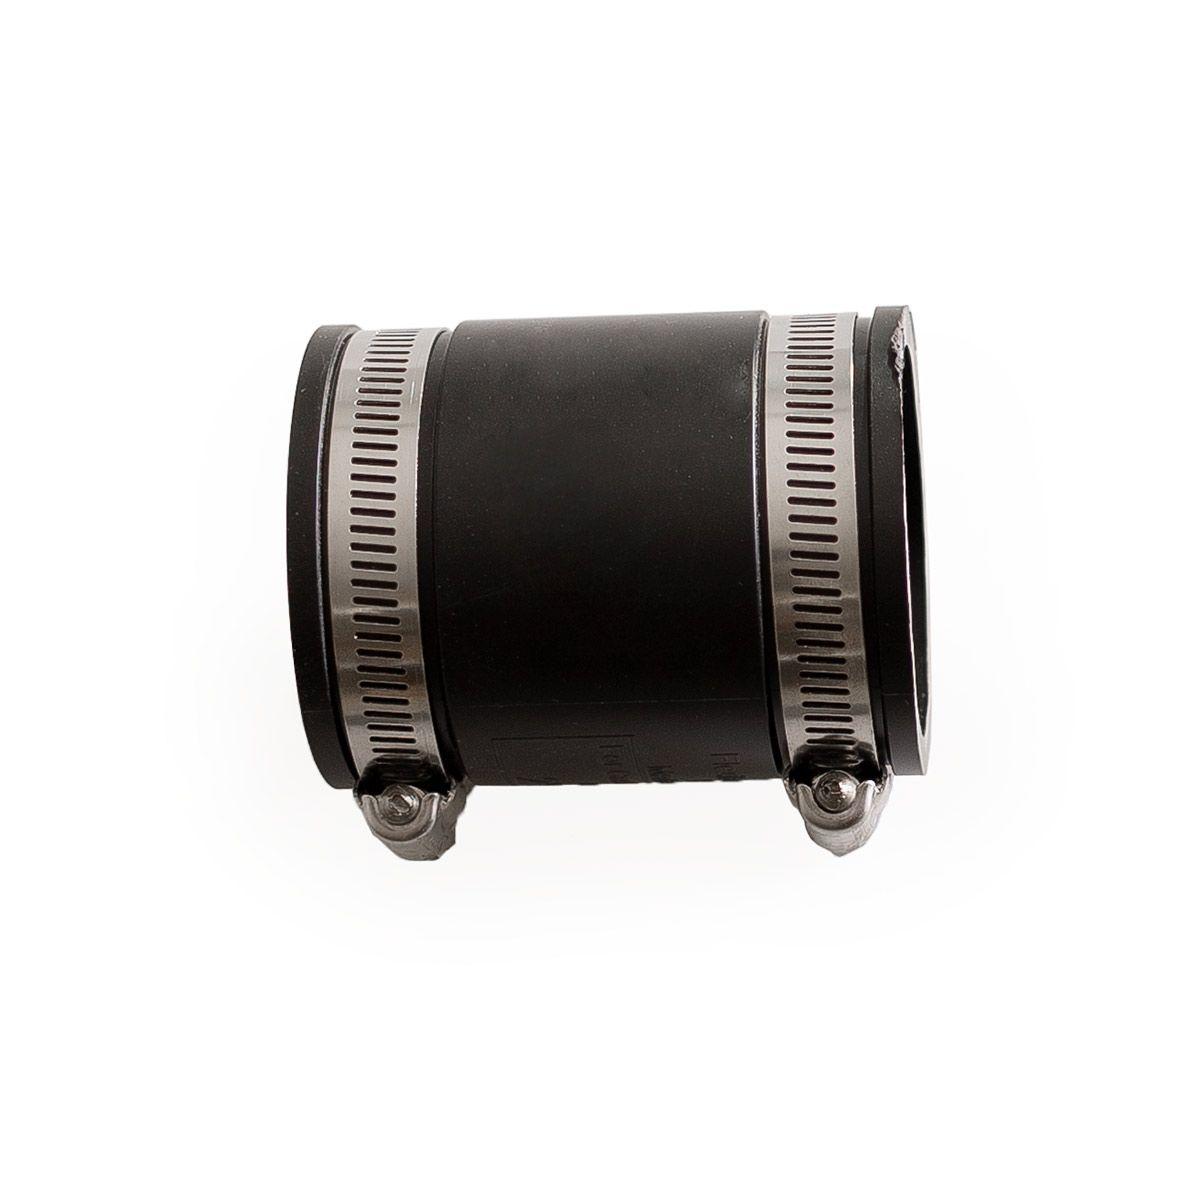 Flexible Muffe, aus PVC Elastomer, schwarz, 44 - 50 mm